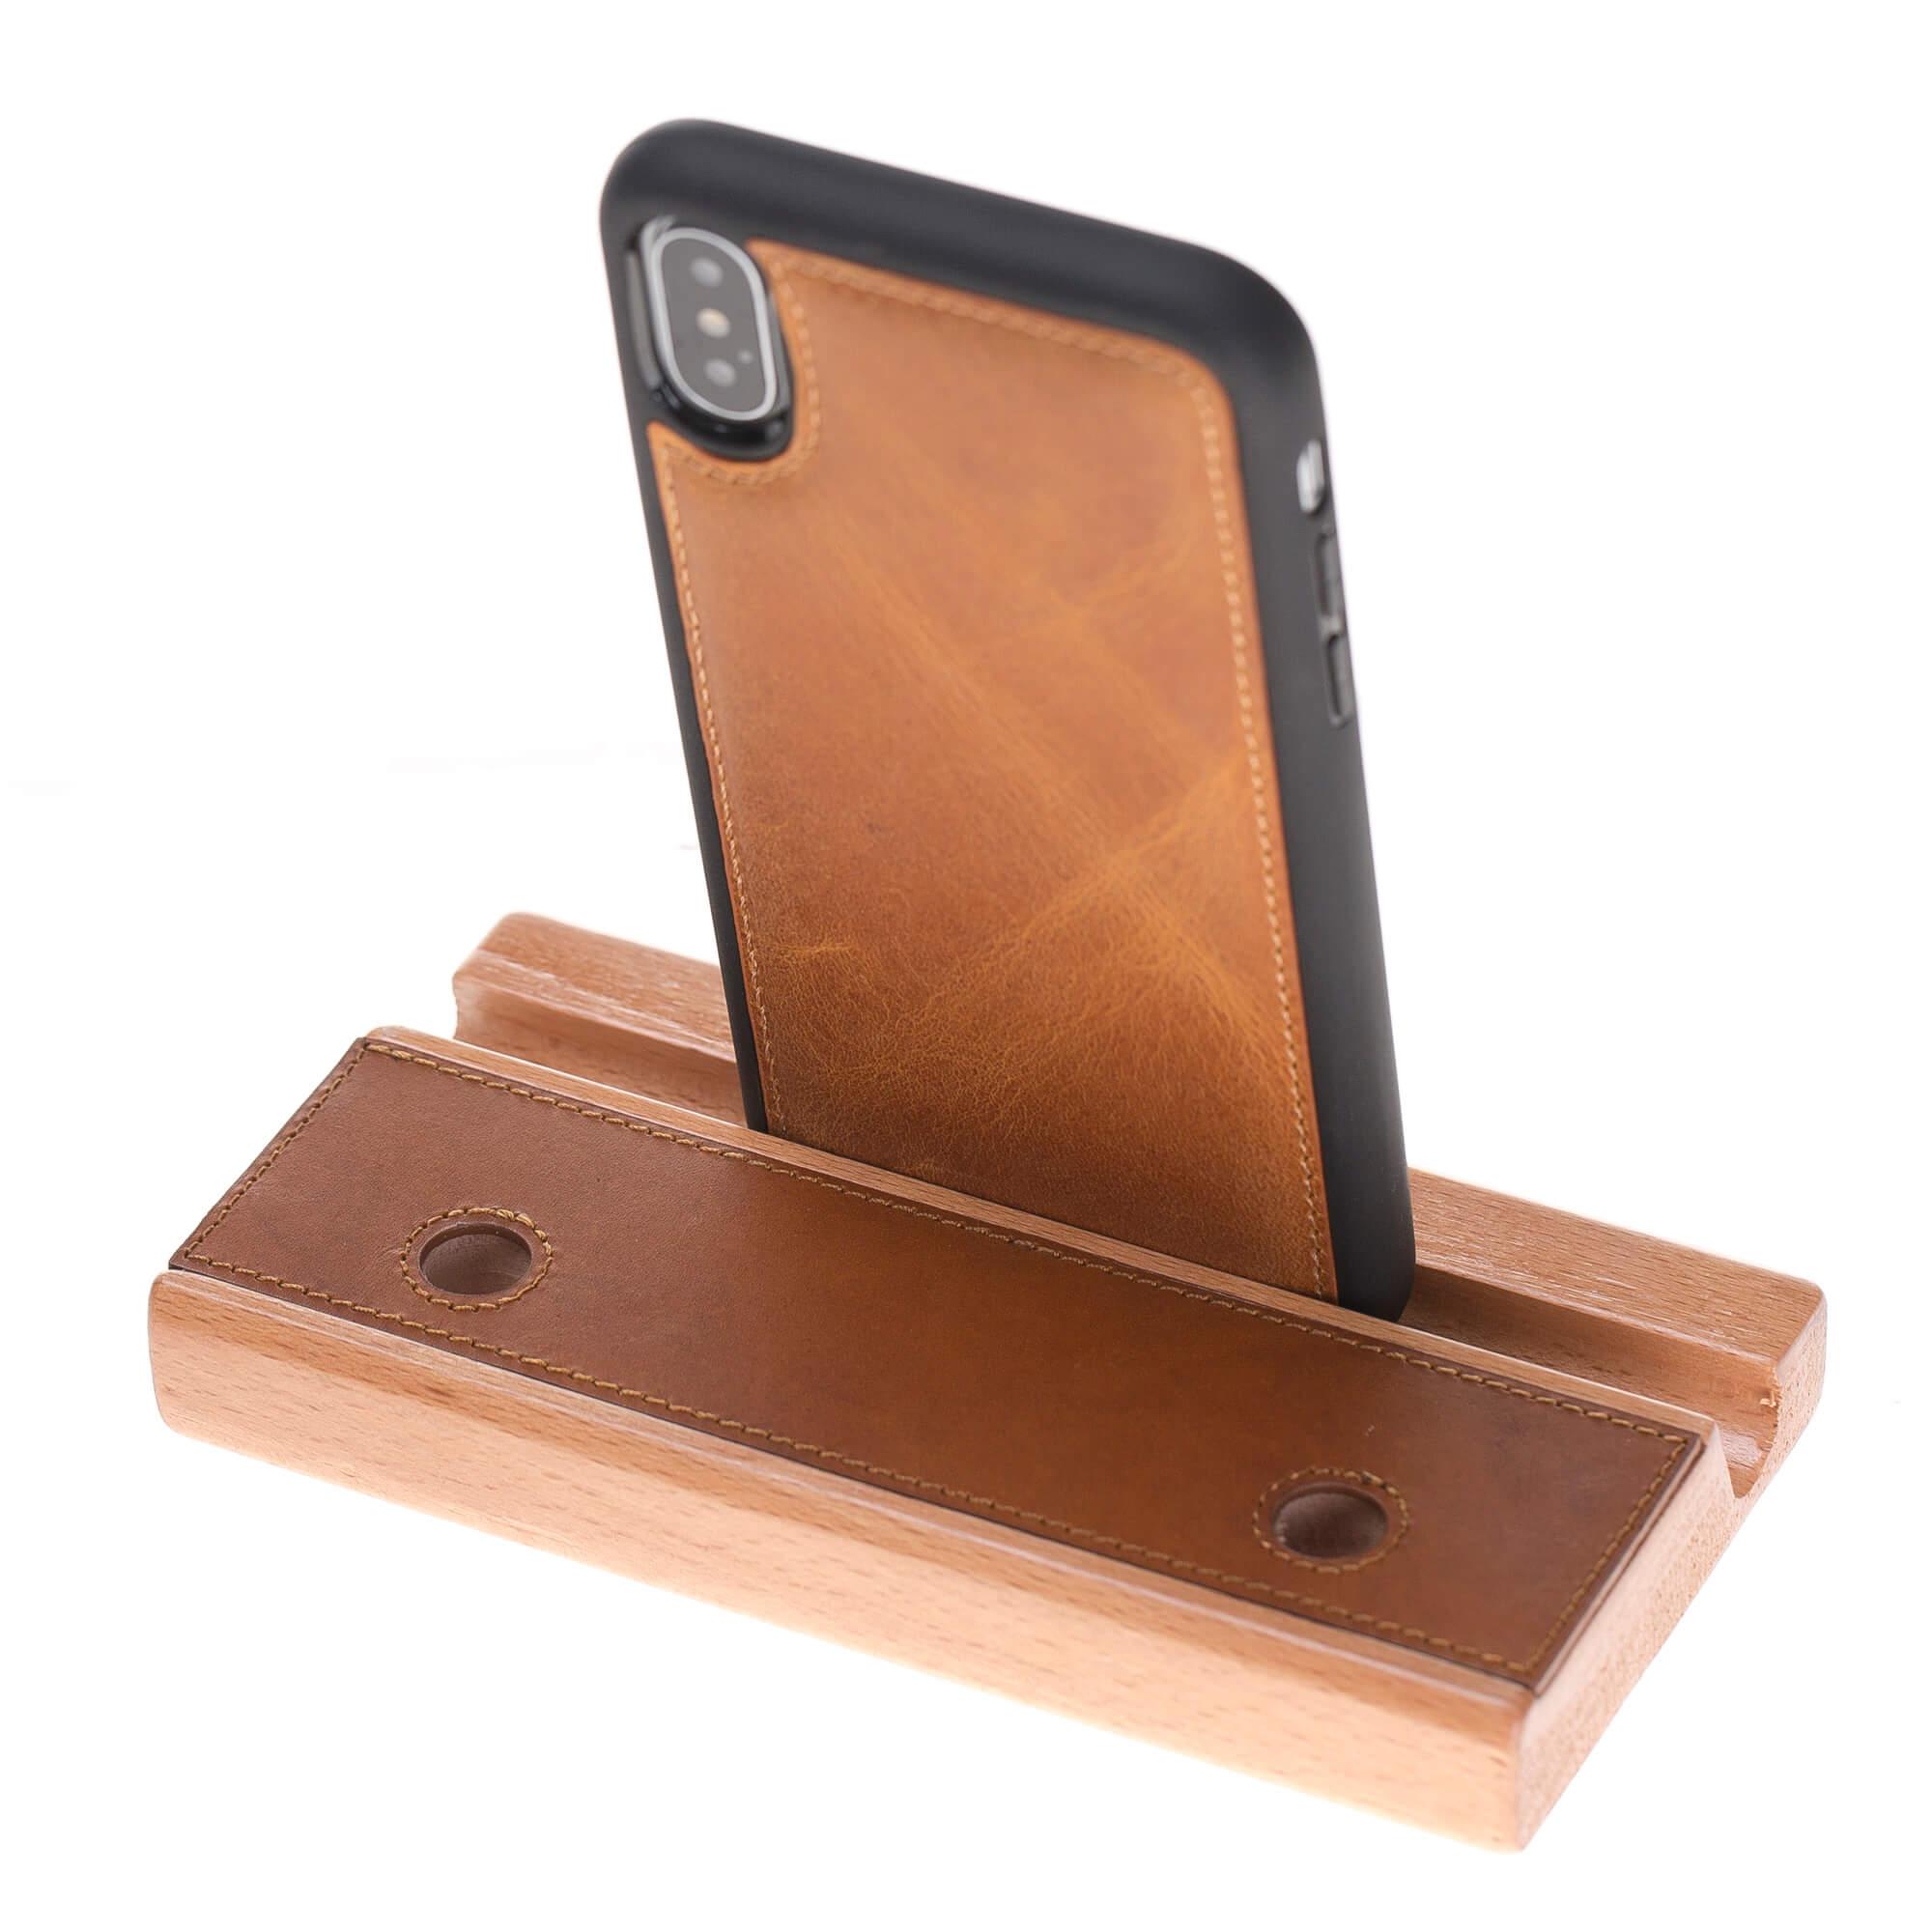 universal halter f r smartphone tablets in cognac braun. Black Bedroom Furniture Sets. Home Design Ideas